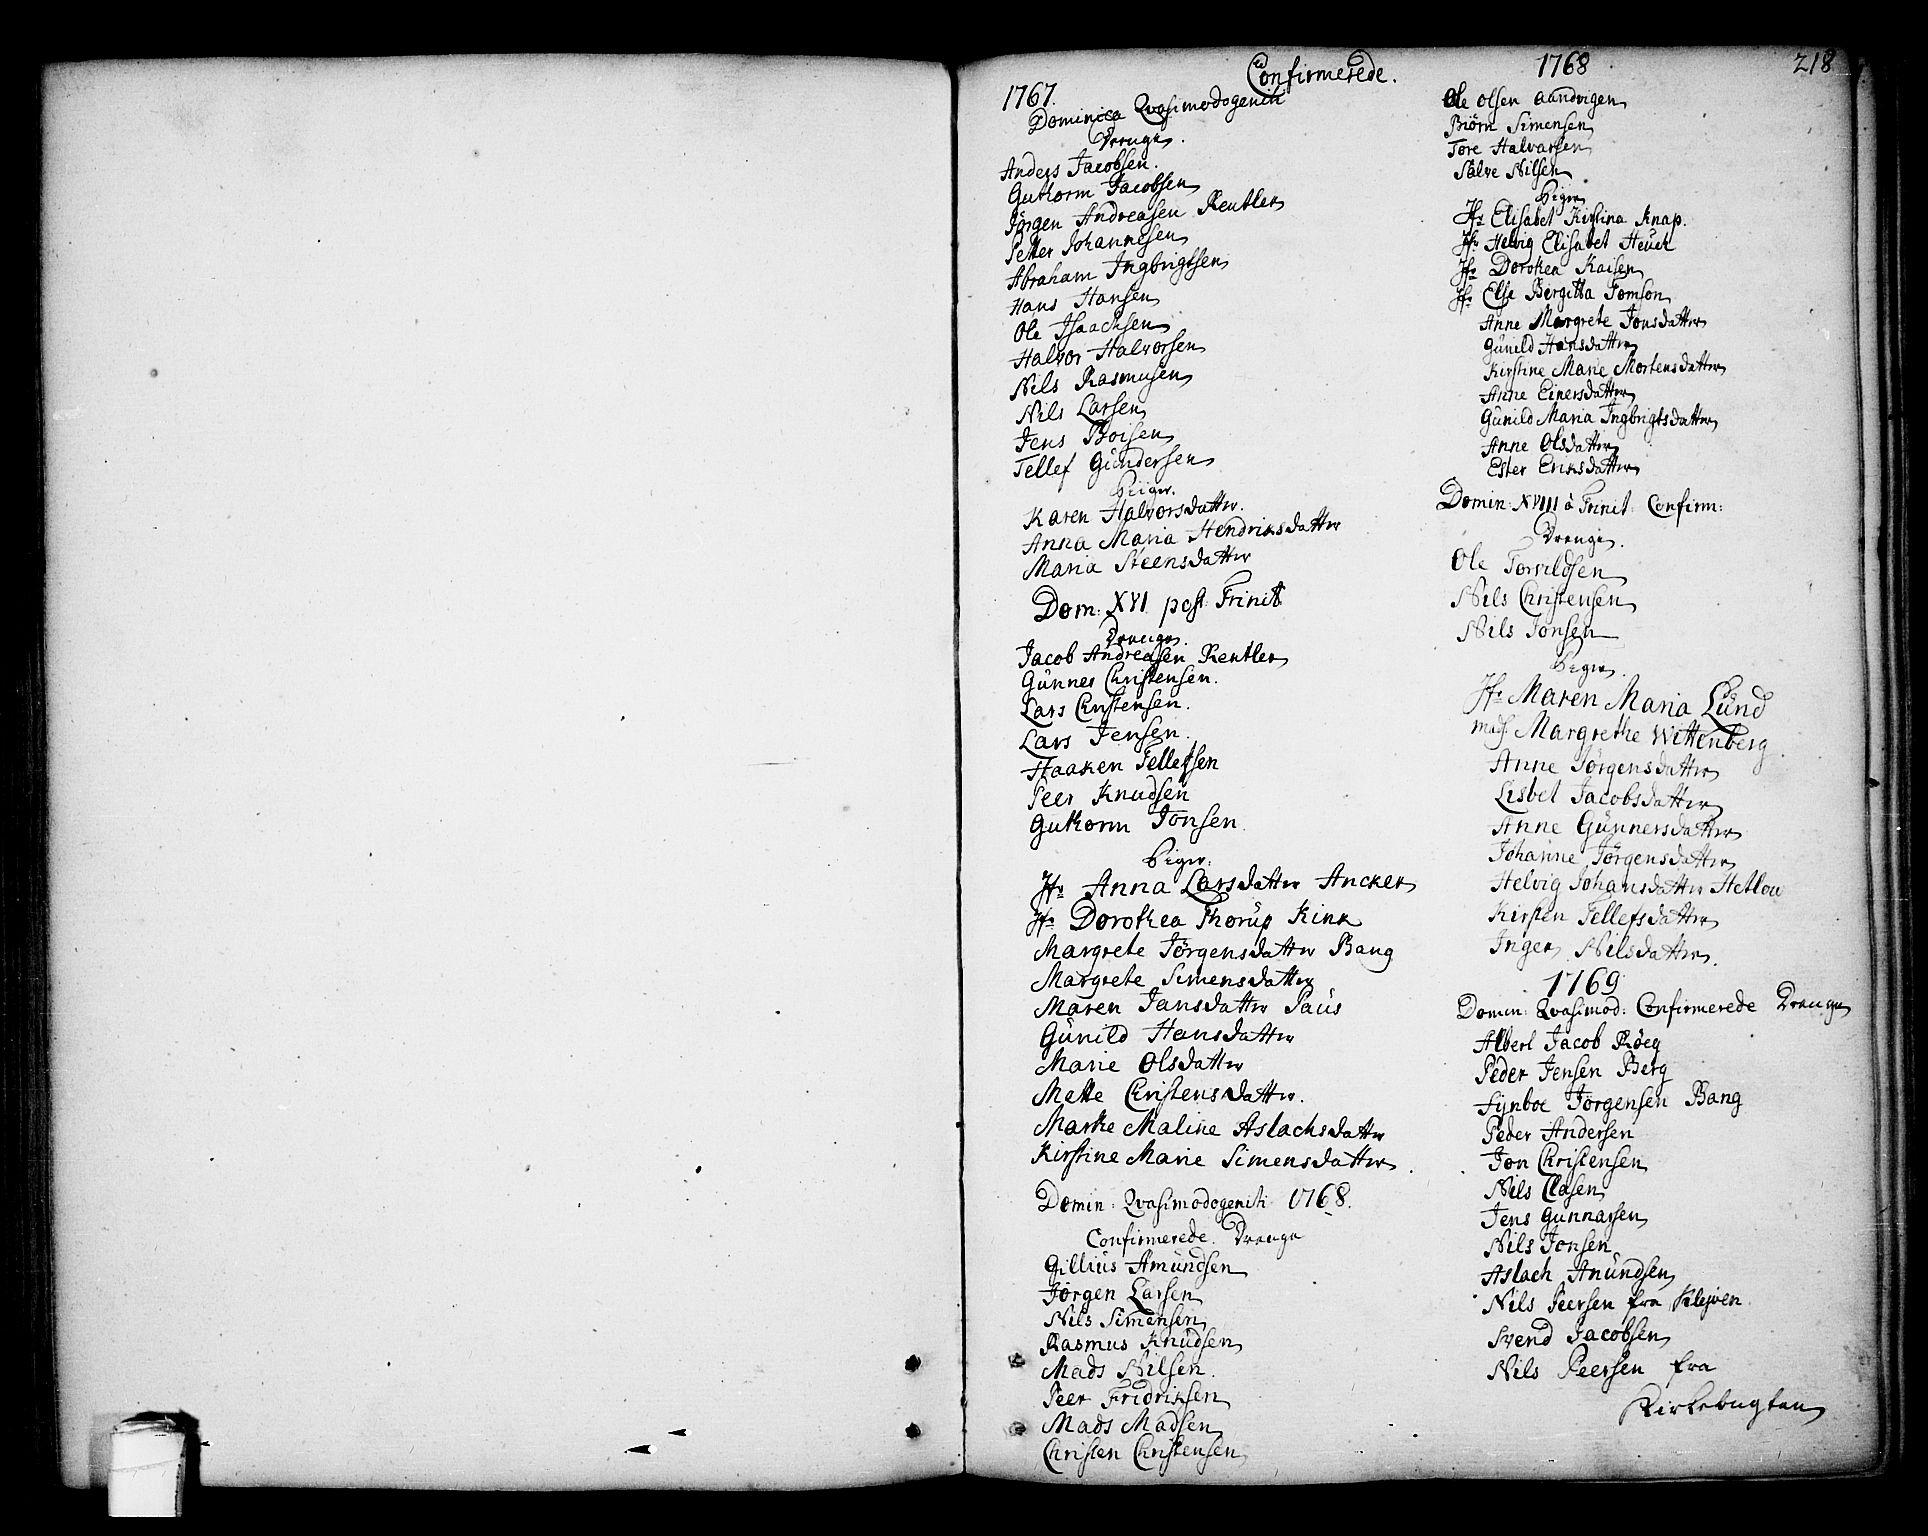 SAKO, Kragerø kirkebøker, F/Fa/L0002: Ministerialbok nr. 2, 1767-1802, s. 218